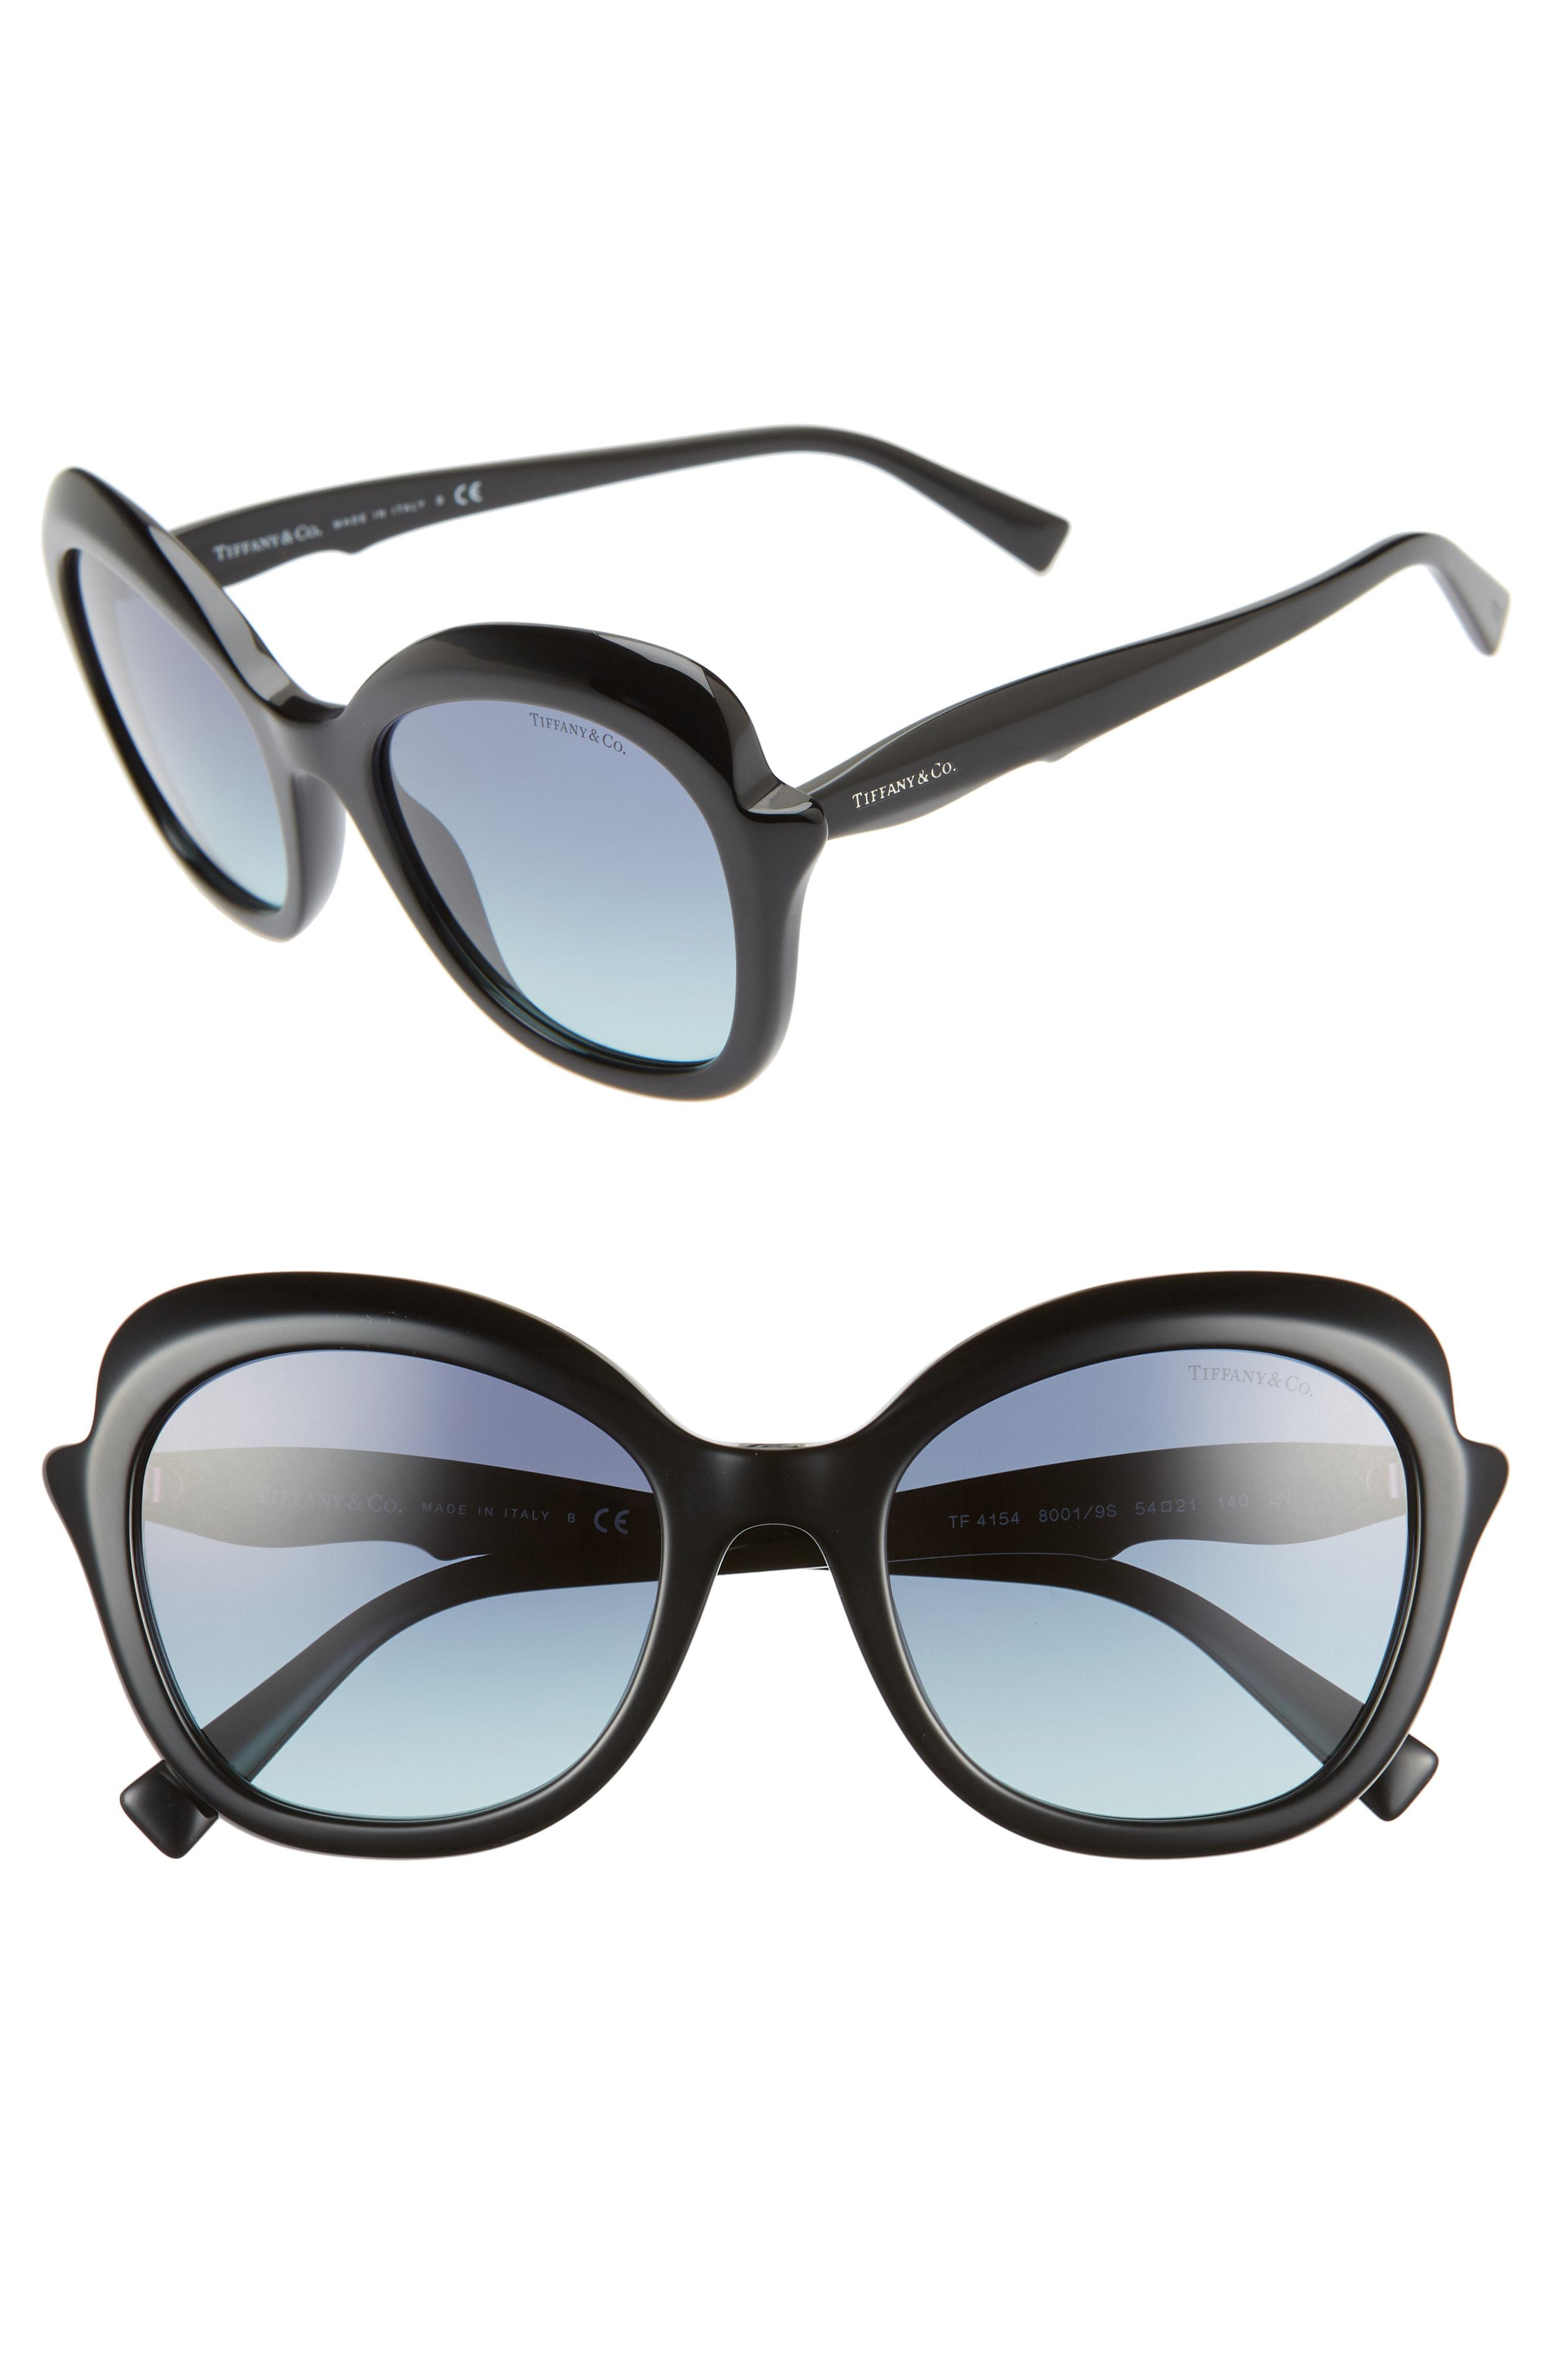 fd16dbc97 Tiffany & Co. Women's Black Paper Flowers 54mm Gradient Round Sunglasses